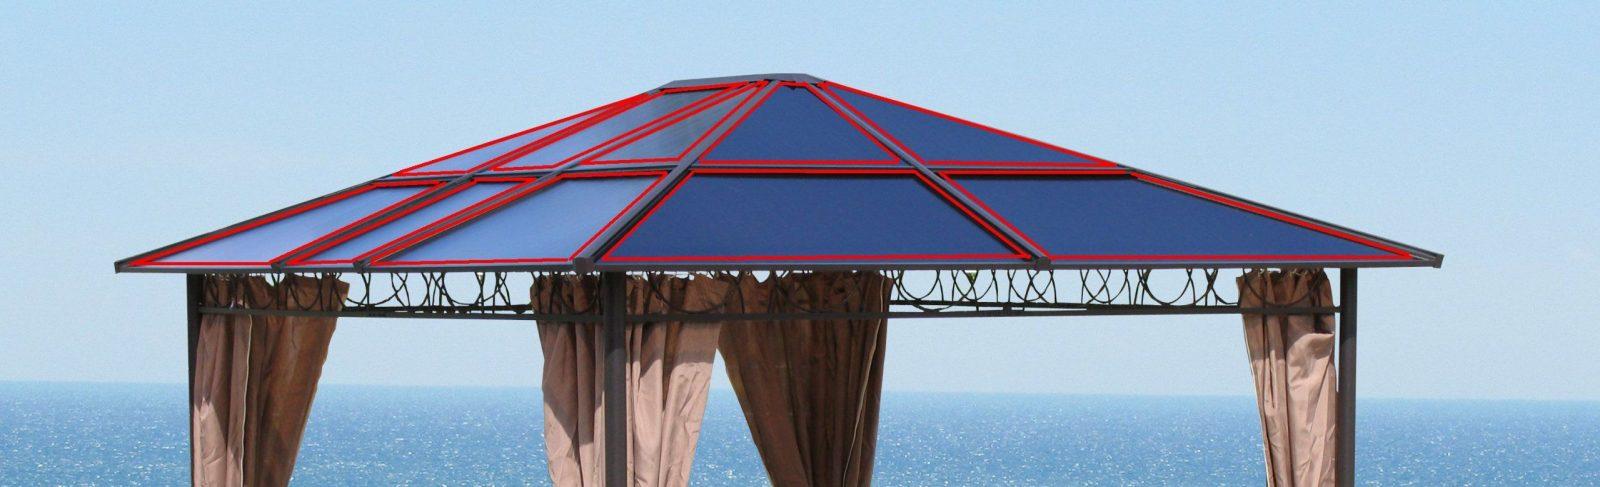 Ersatzdach Hardtop Pavillon 3X36M Doppelstegplatten Polycarbonat von Hardtop Pavillon 3X3 6M Photo